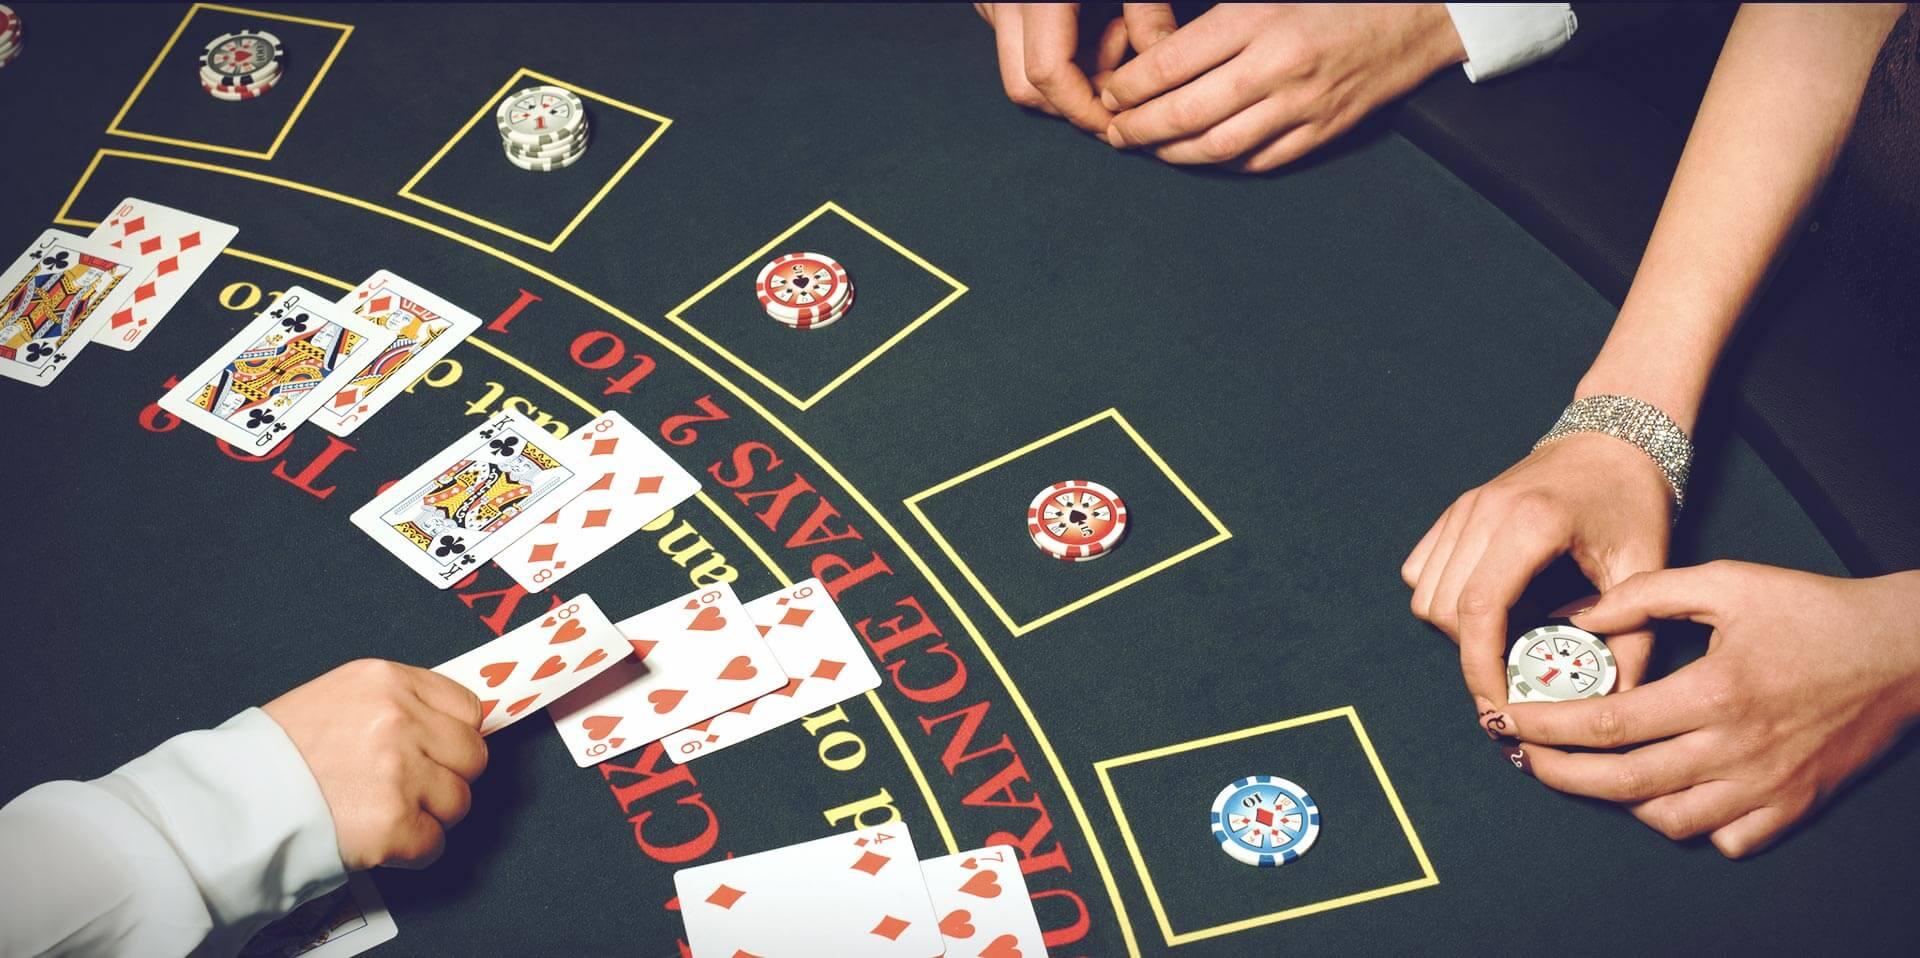 Il Blackjack online nei casino